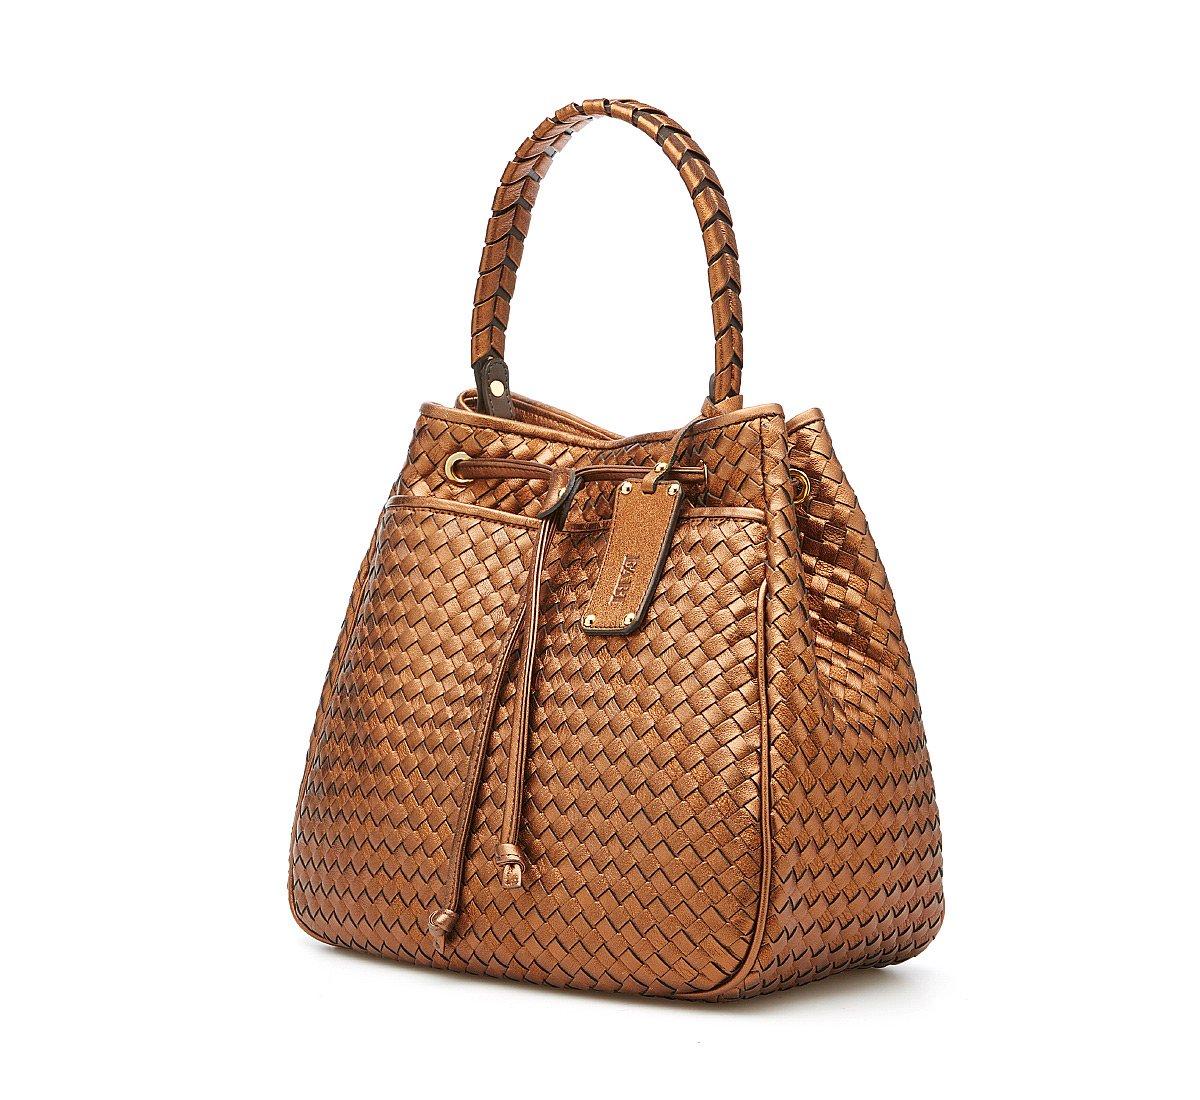 Wicker calf leatherbag